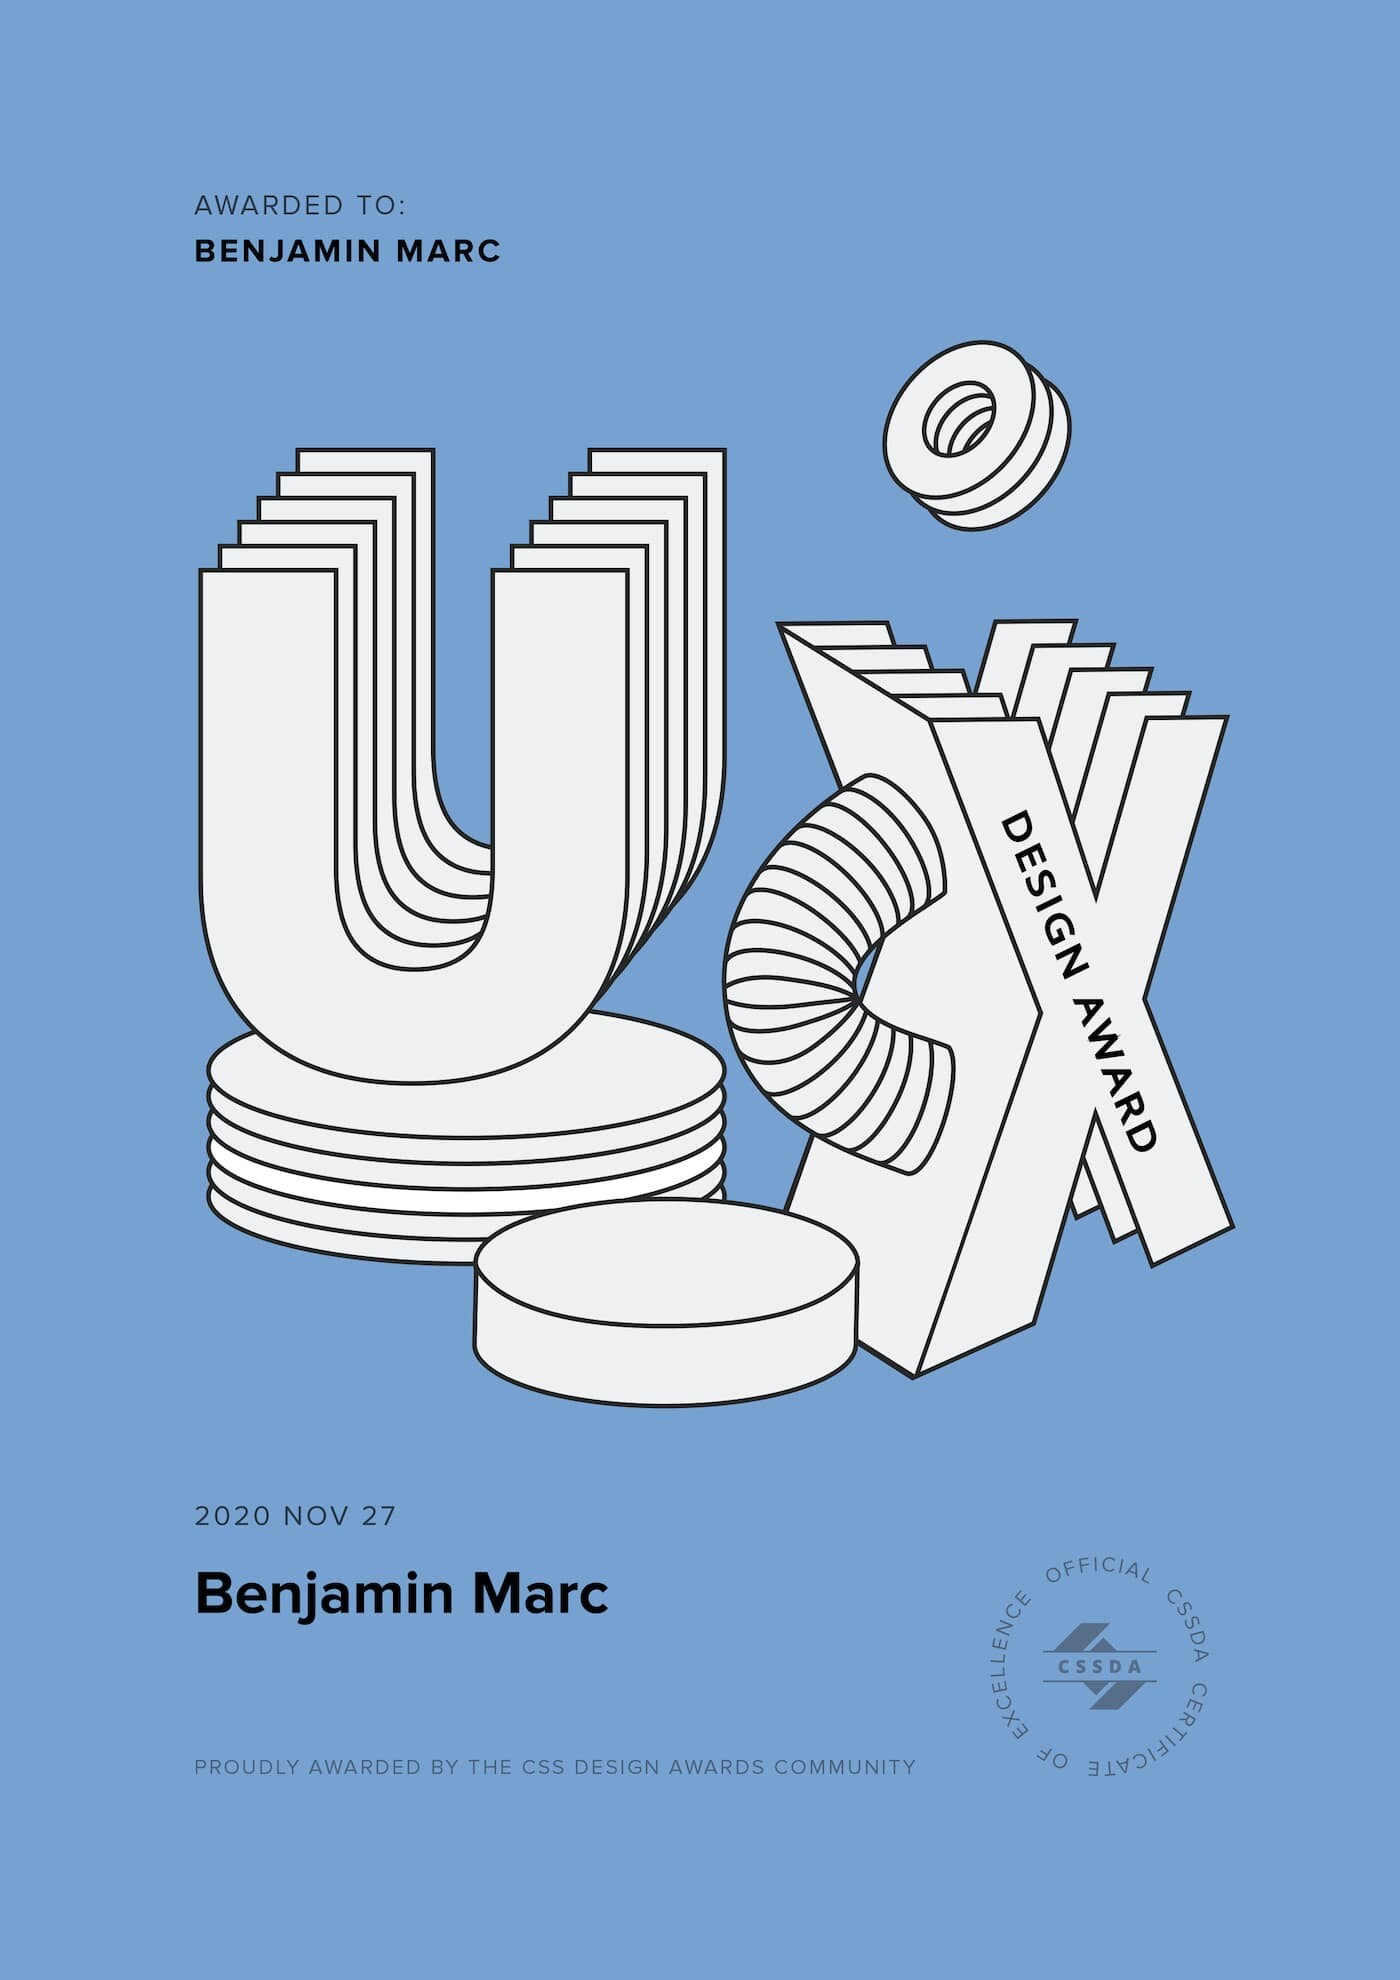 Benjamin Marc Wins Award for Best UI, UX Design and Innovation